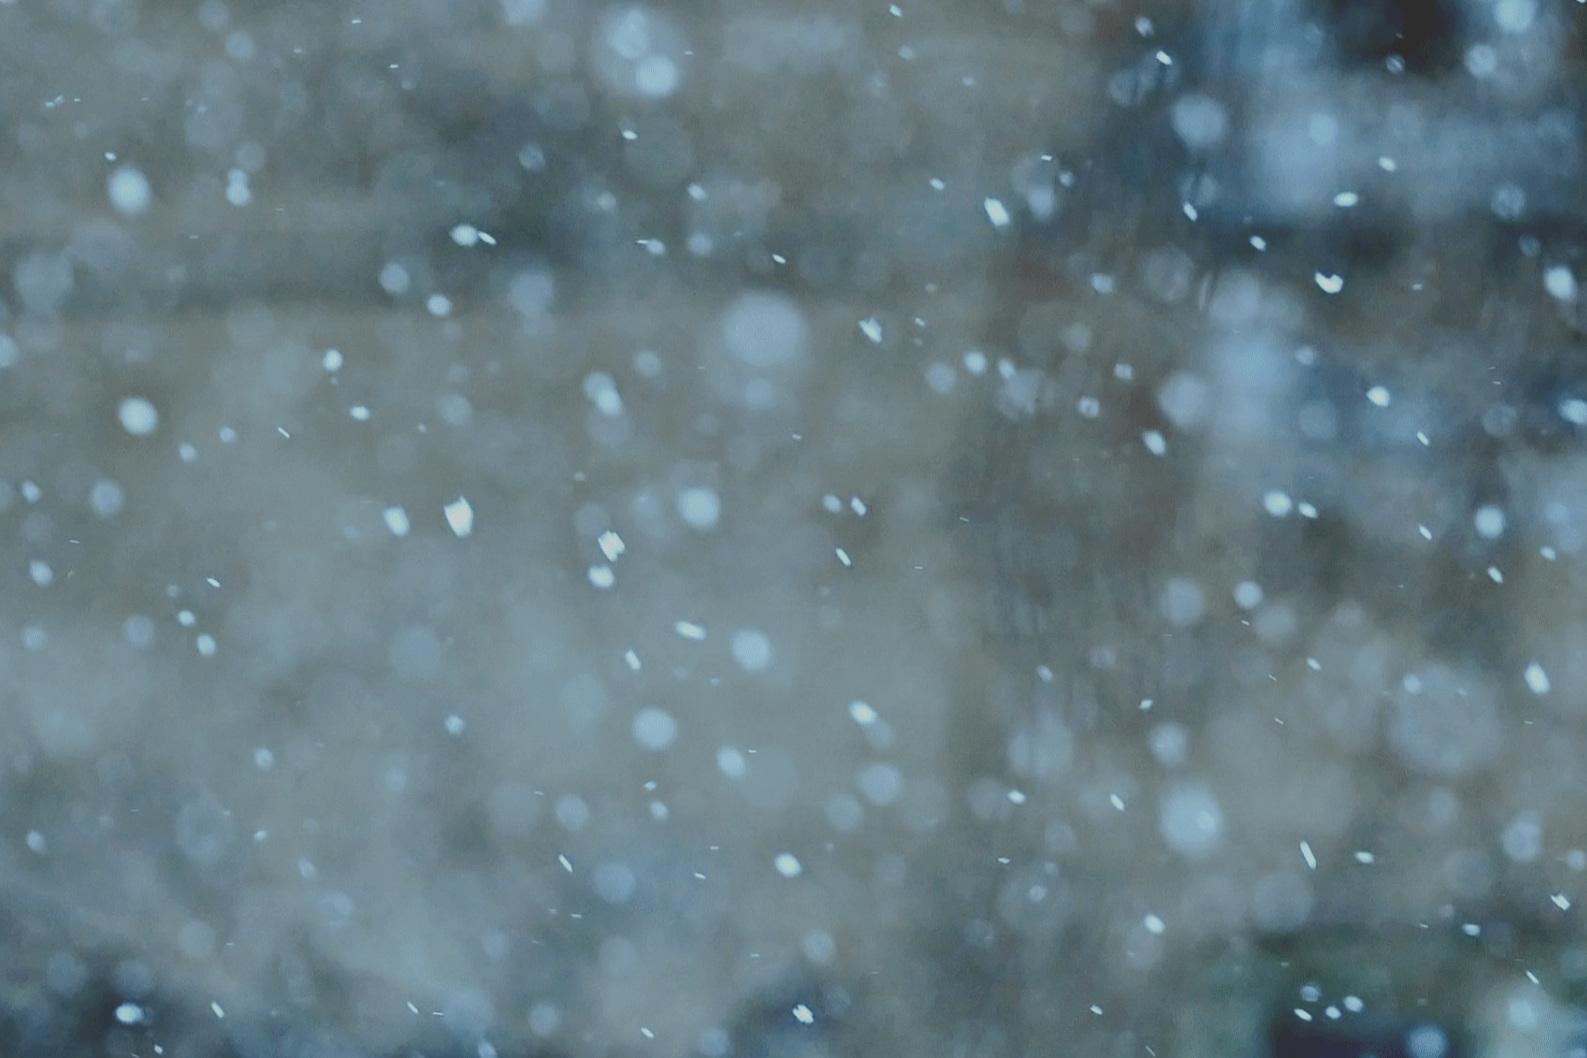 FABIO'S WINTER INTENSIVE - Five consecutive mornings of warming Yoga this WinterMon 15th - Fri 19th July6.30-8.00am$125